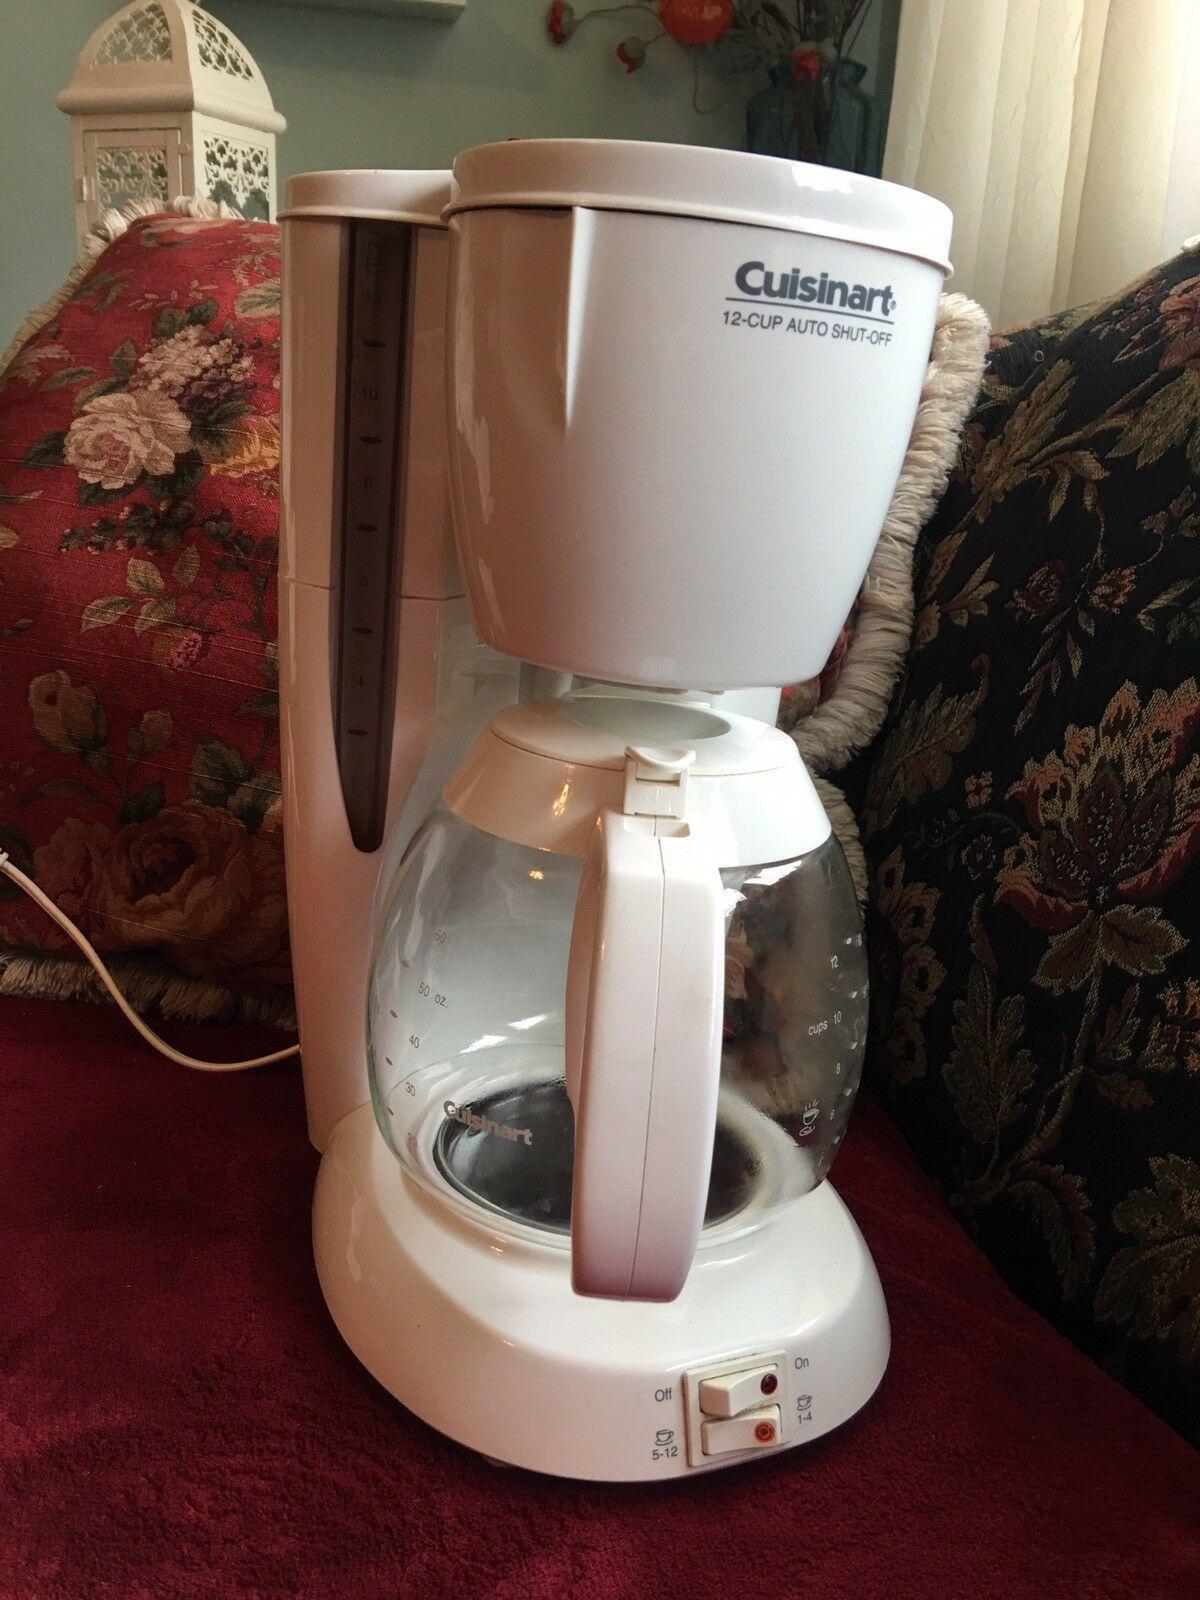 Rare Cuisinart Coffee Bar Dcc 200 White 12 Cups Coffee Maker Auto Shut Of In 2020 Coffee Maker Single Cup Coffee Maker Cuisinart Coffee Maker